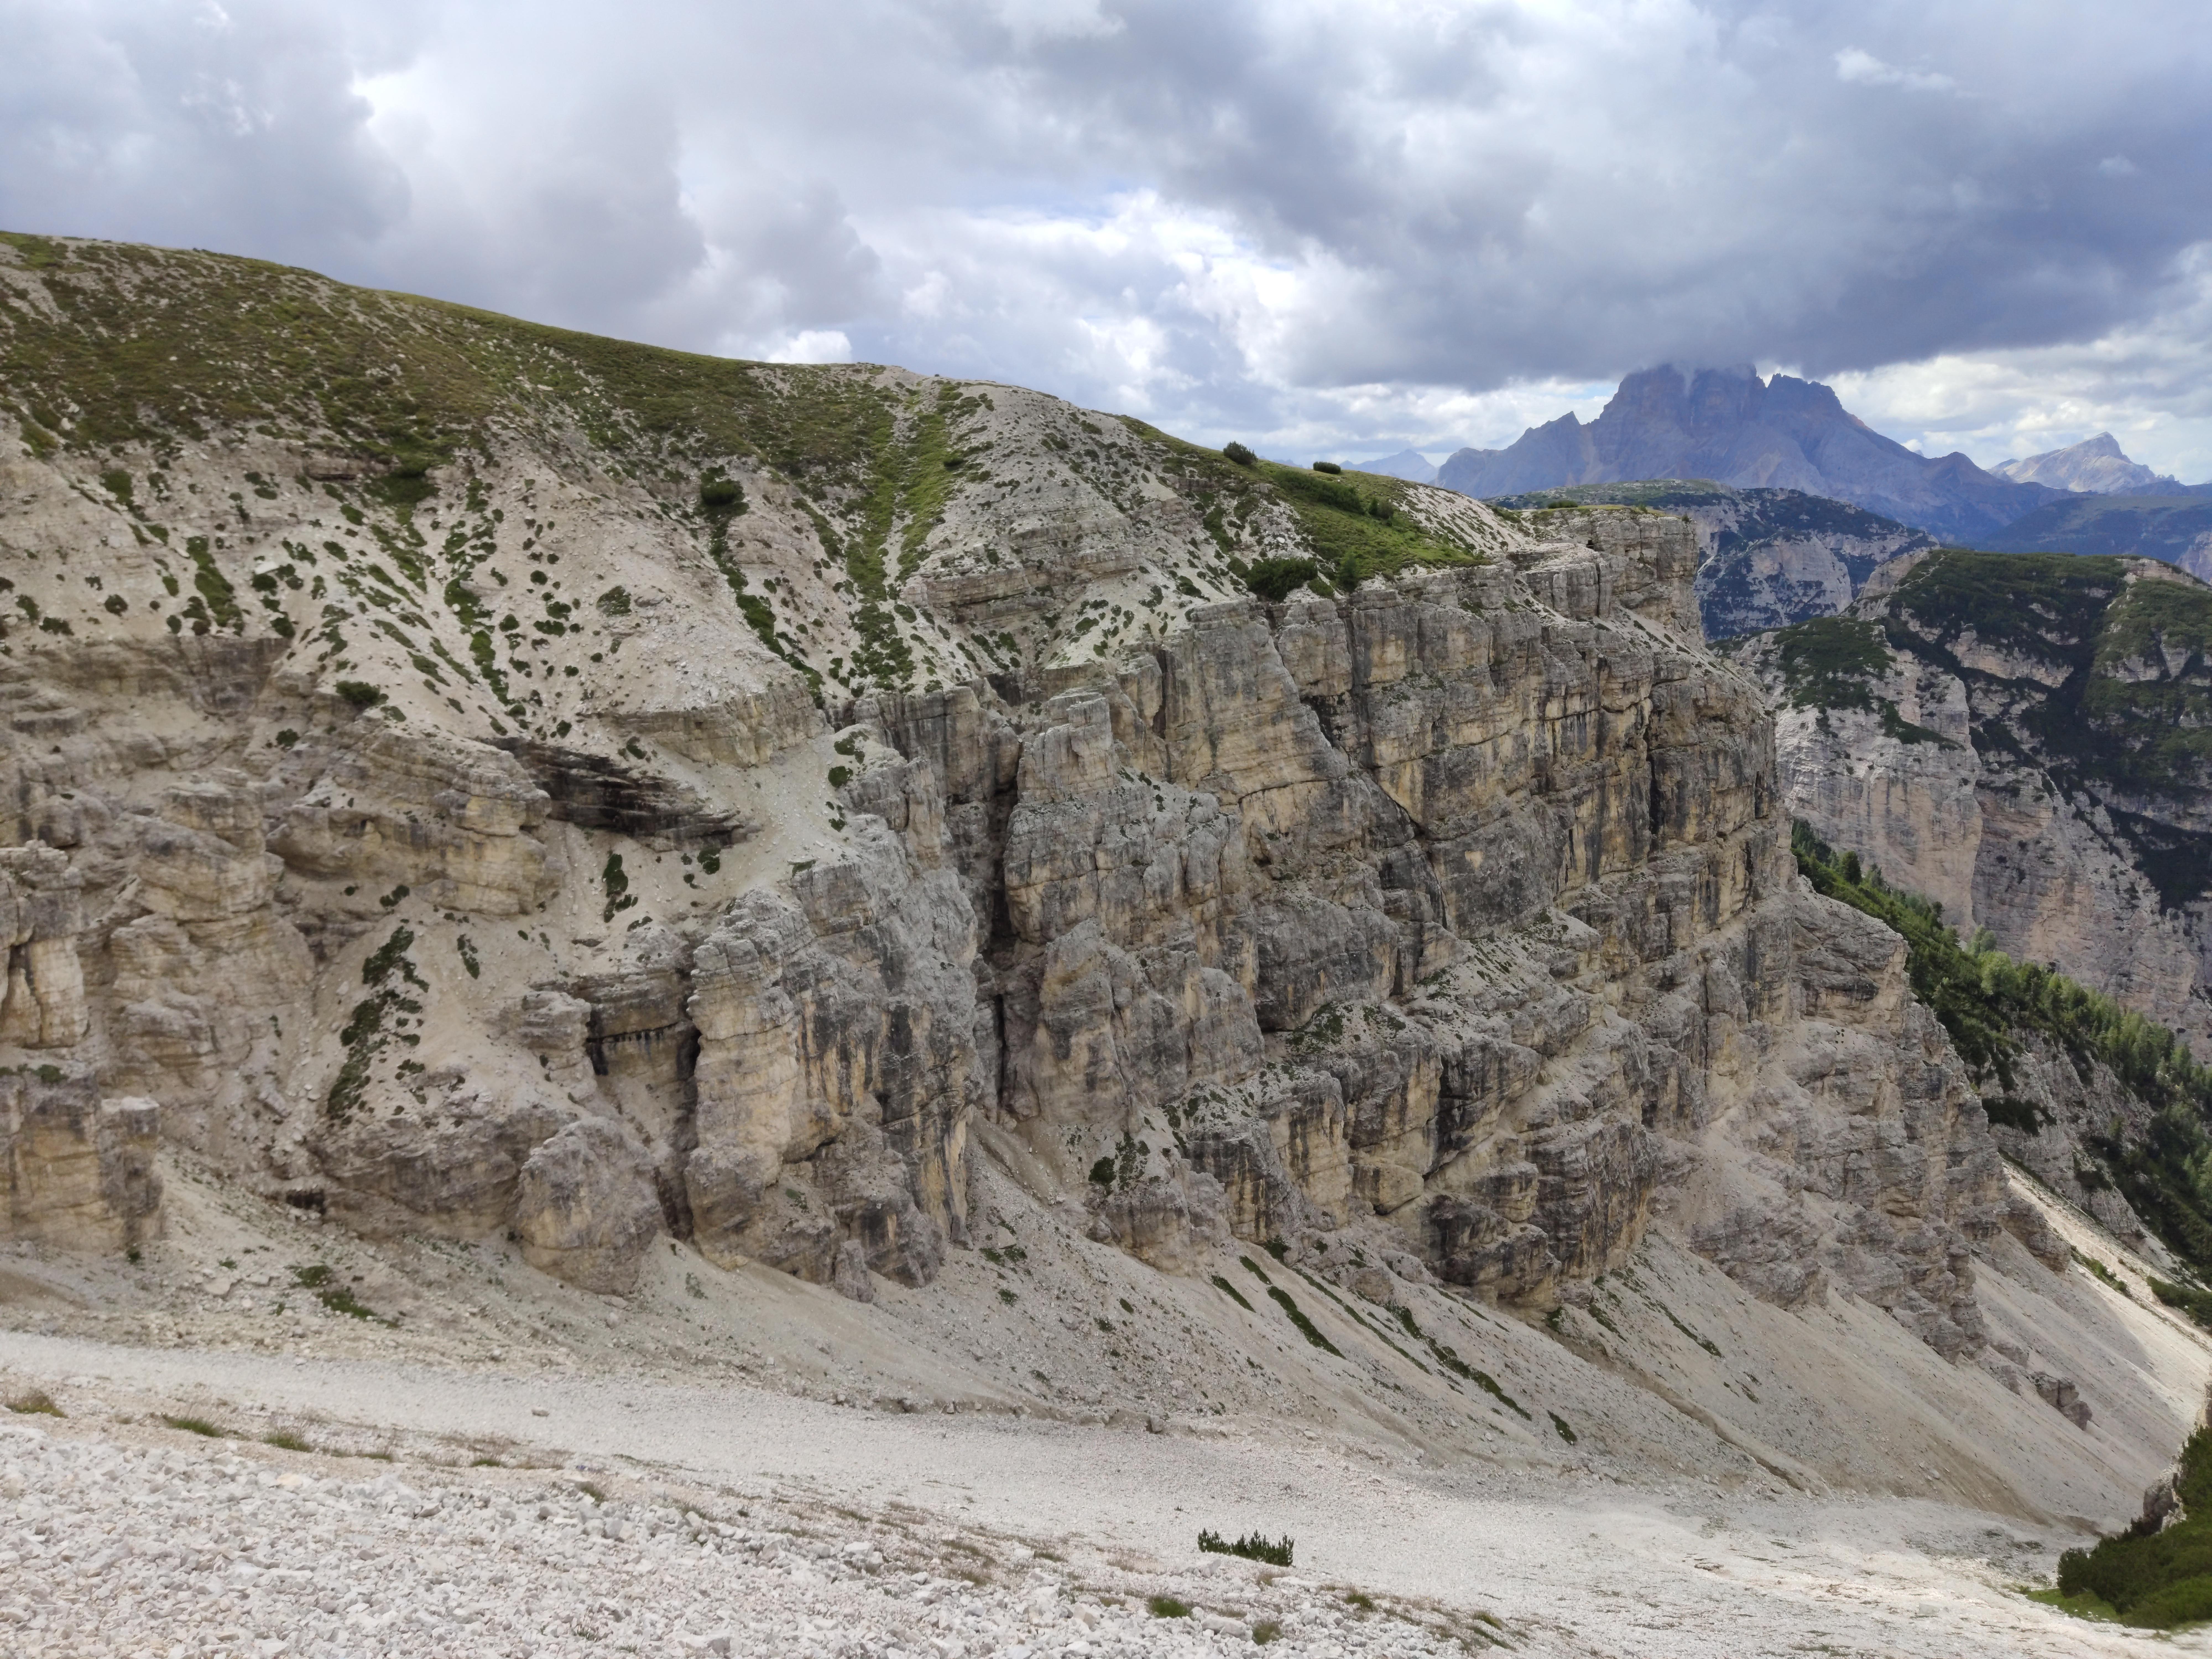 Canyonartige Gebirgsformation bei den Zinnen